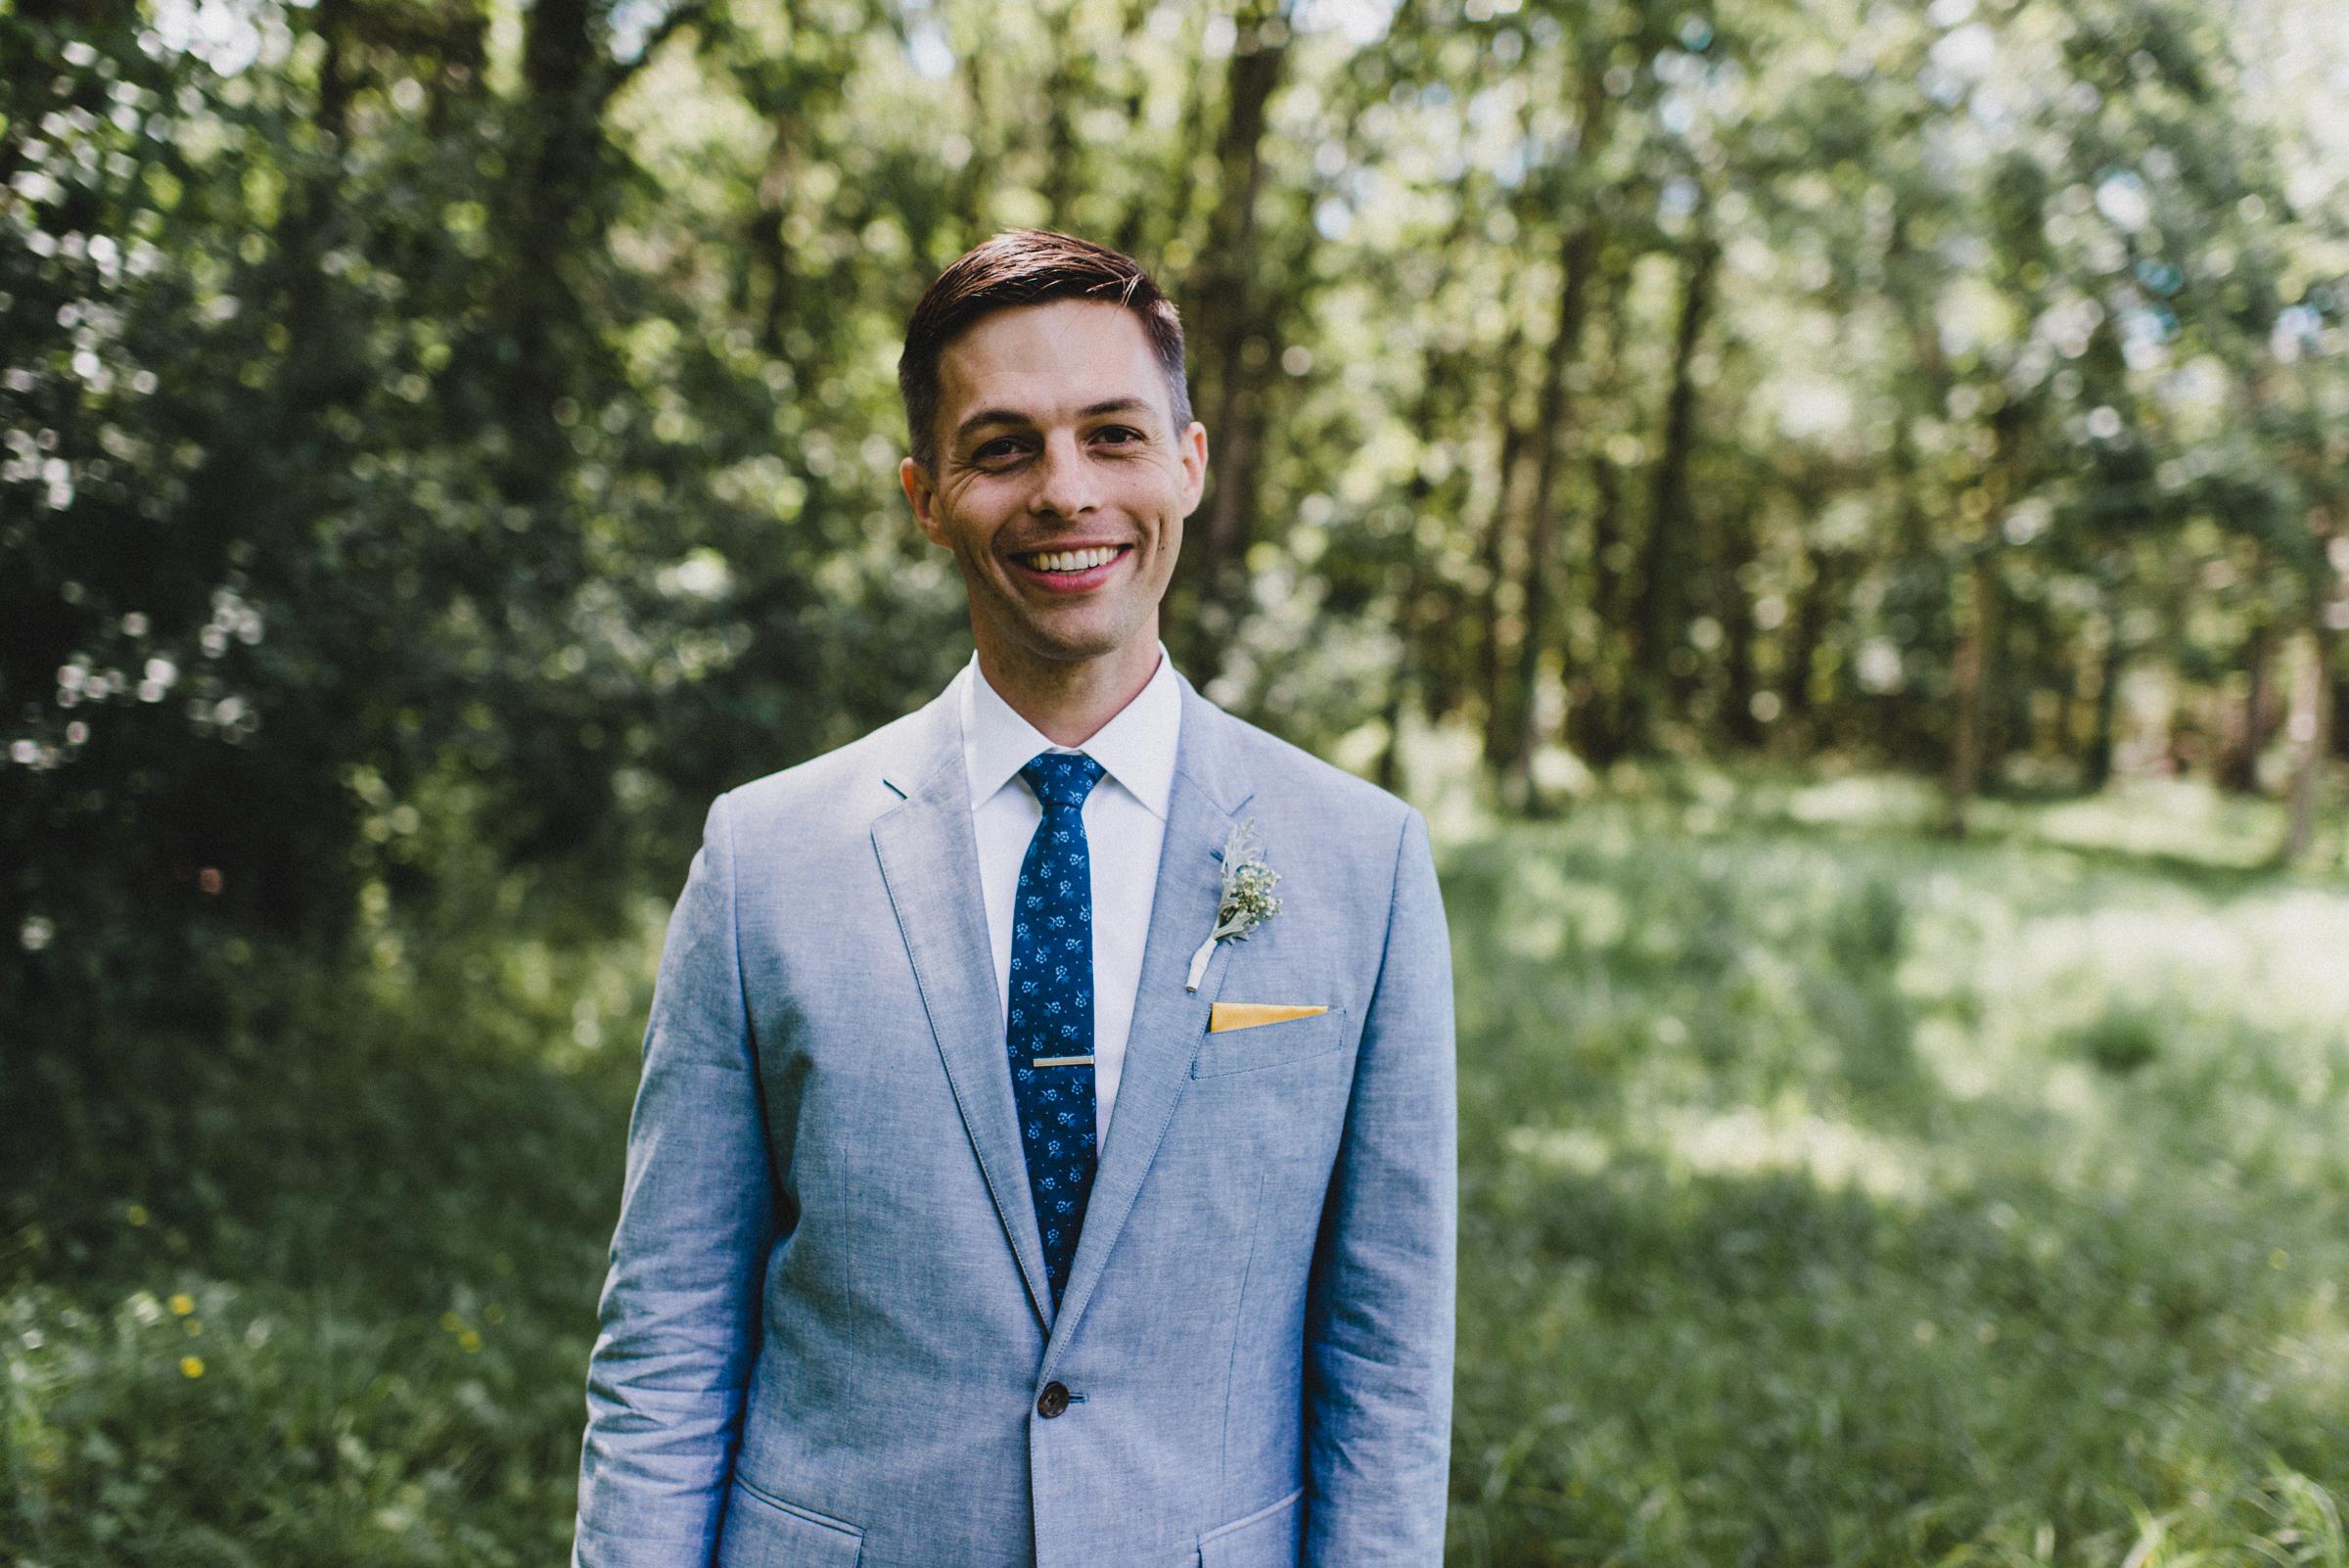 Intimate-Backyard-Farmhouse-Ohio-Wedding-Andi+Ben_Mallory+Justin-Photographers-104.JPG